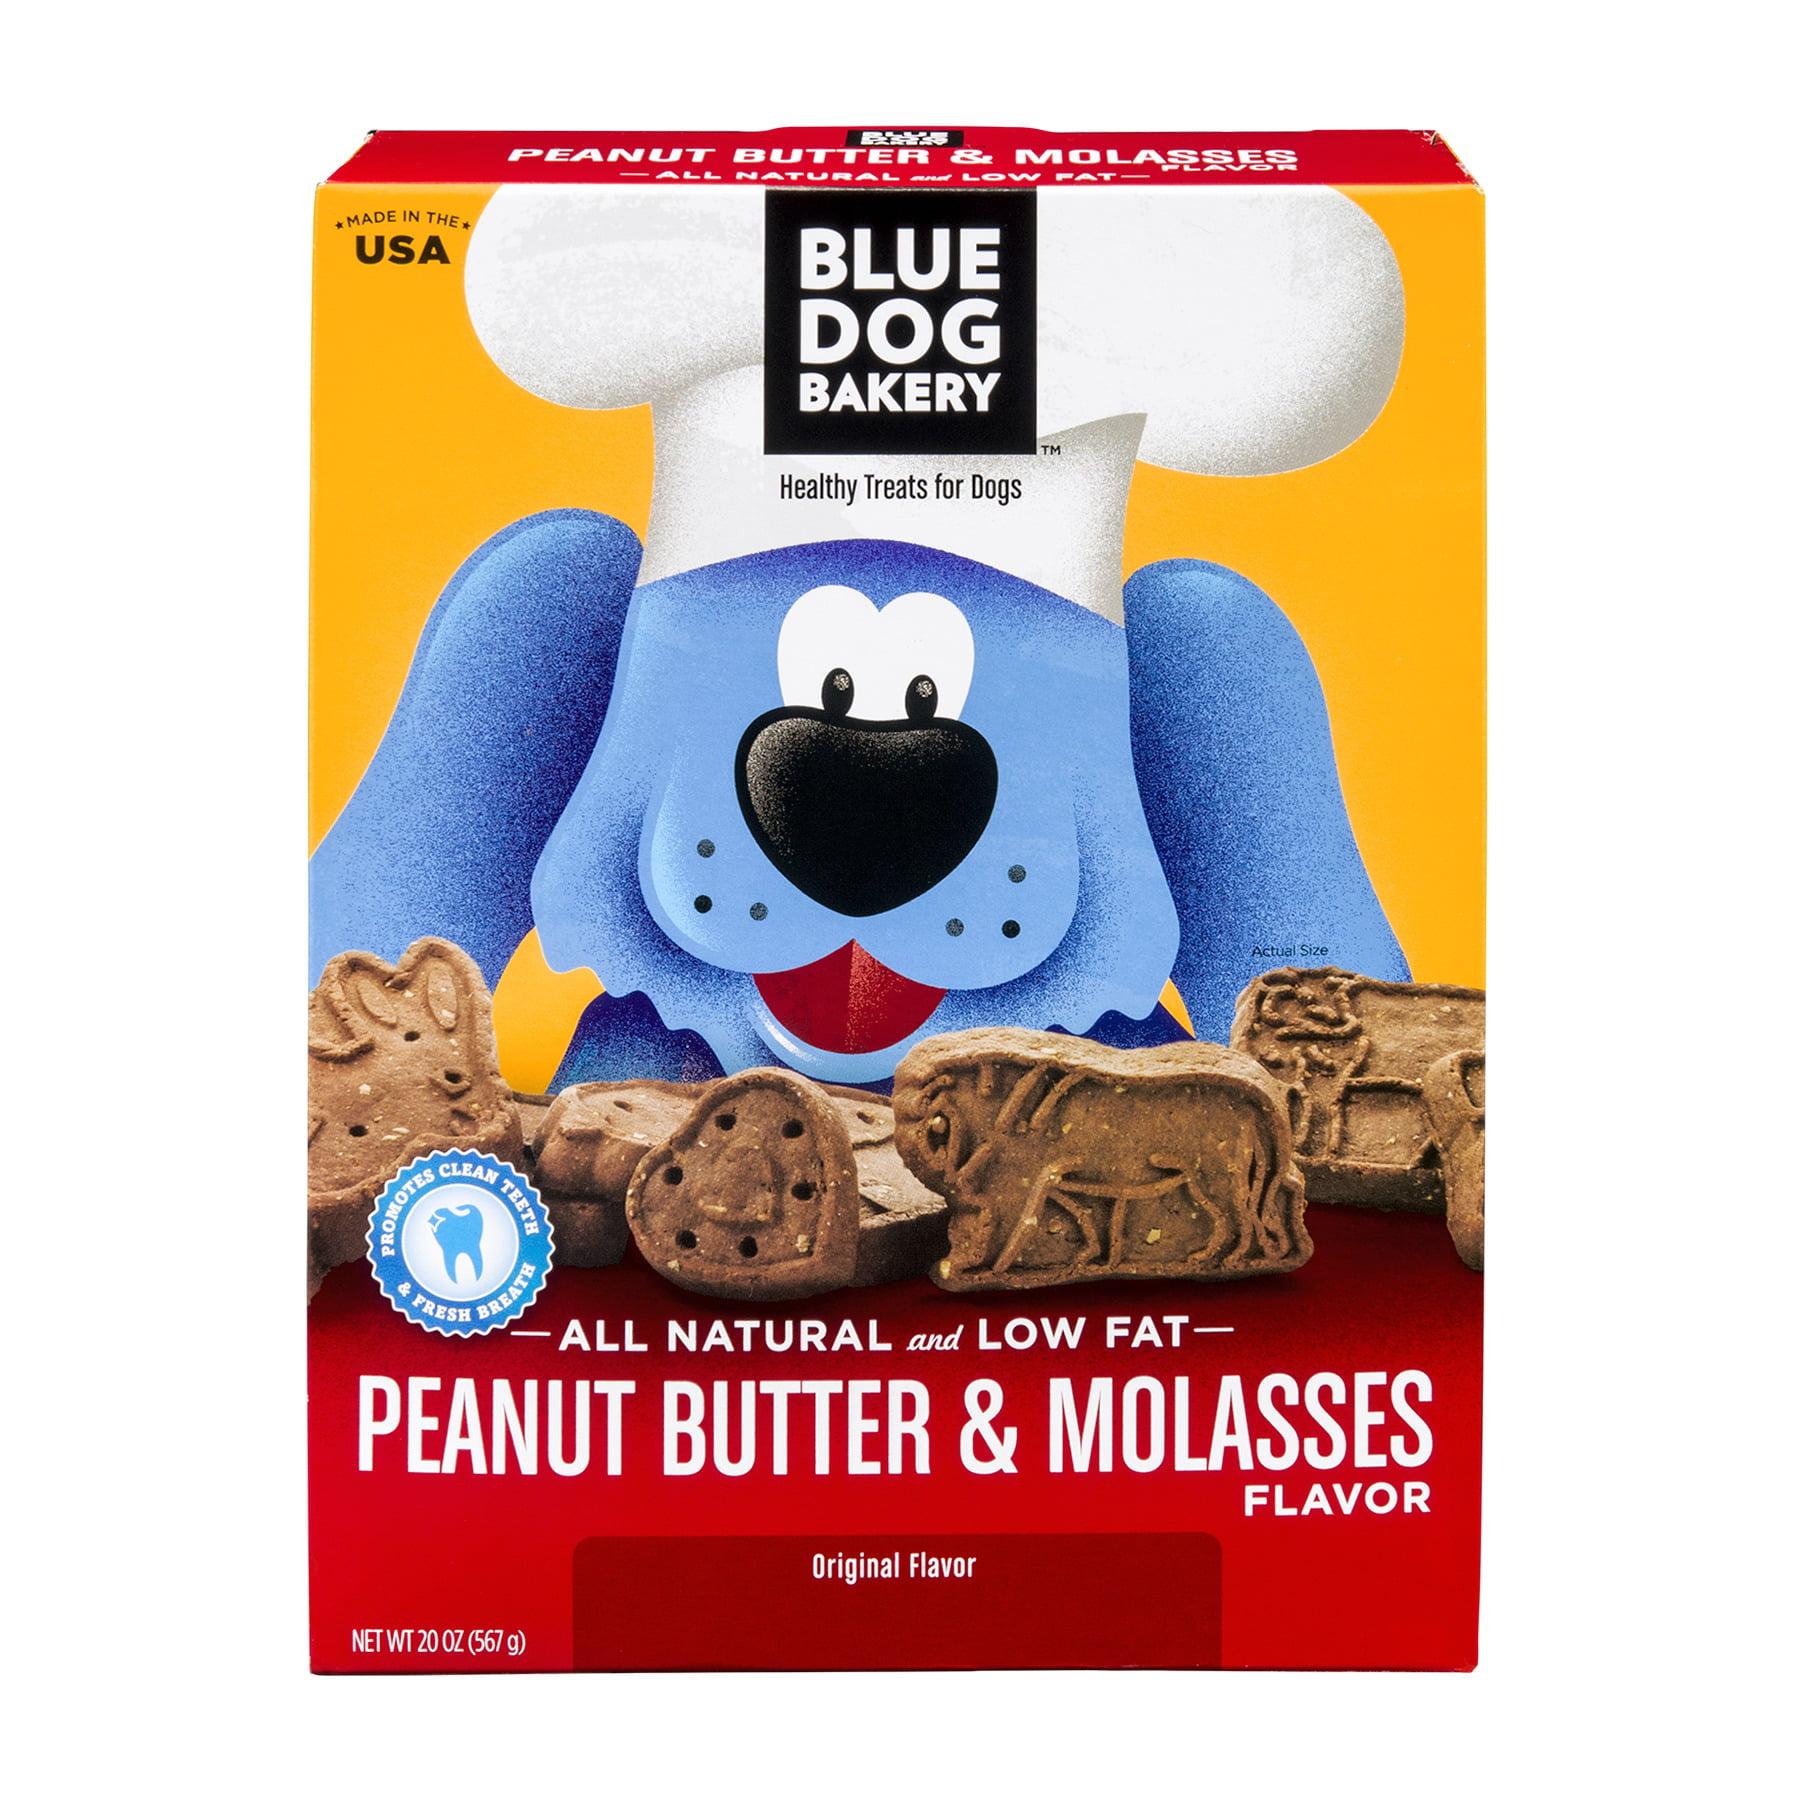 Blue Dog Bakery Peanut Butter & Molasses Healthy Dog Treats, 20 Oz.